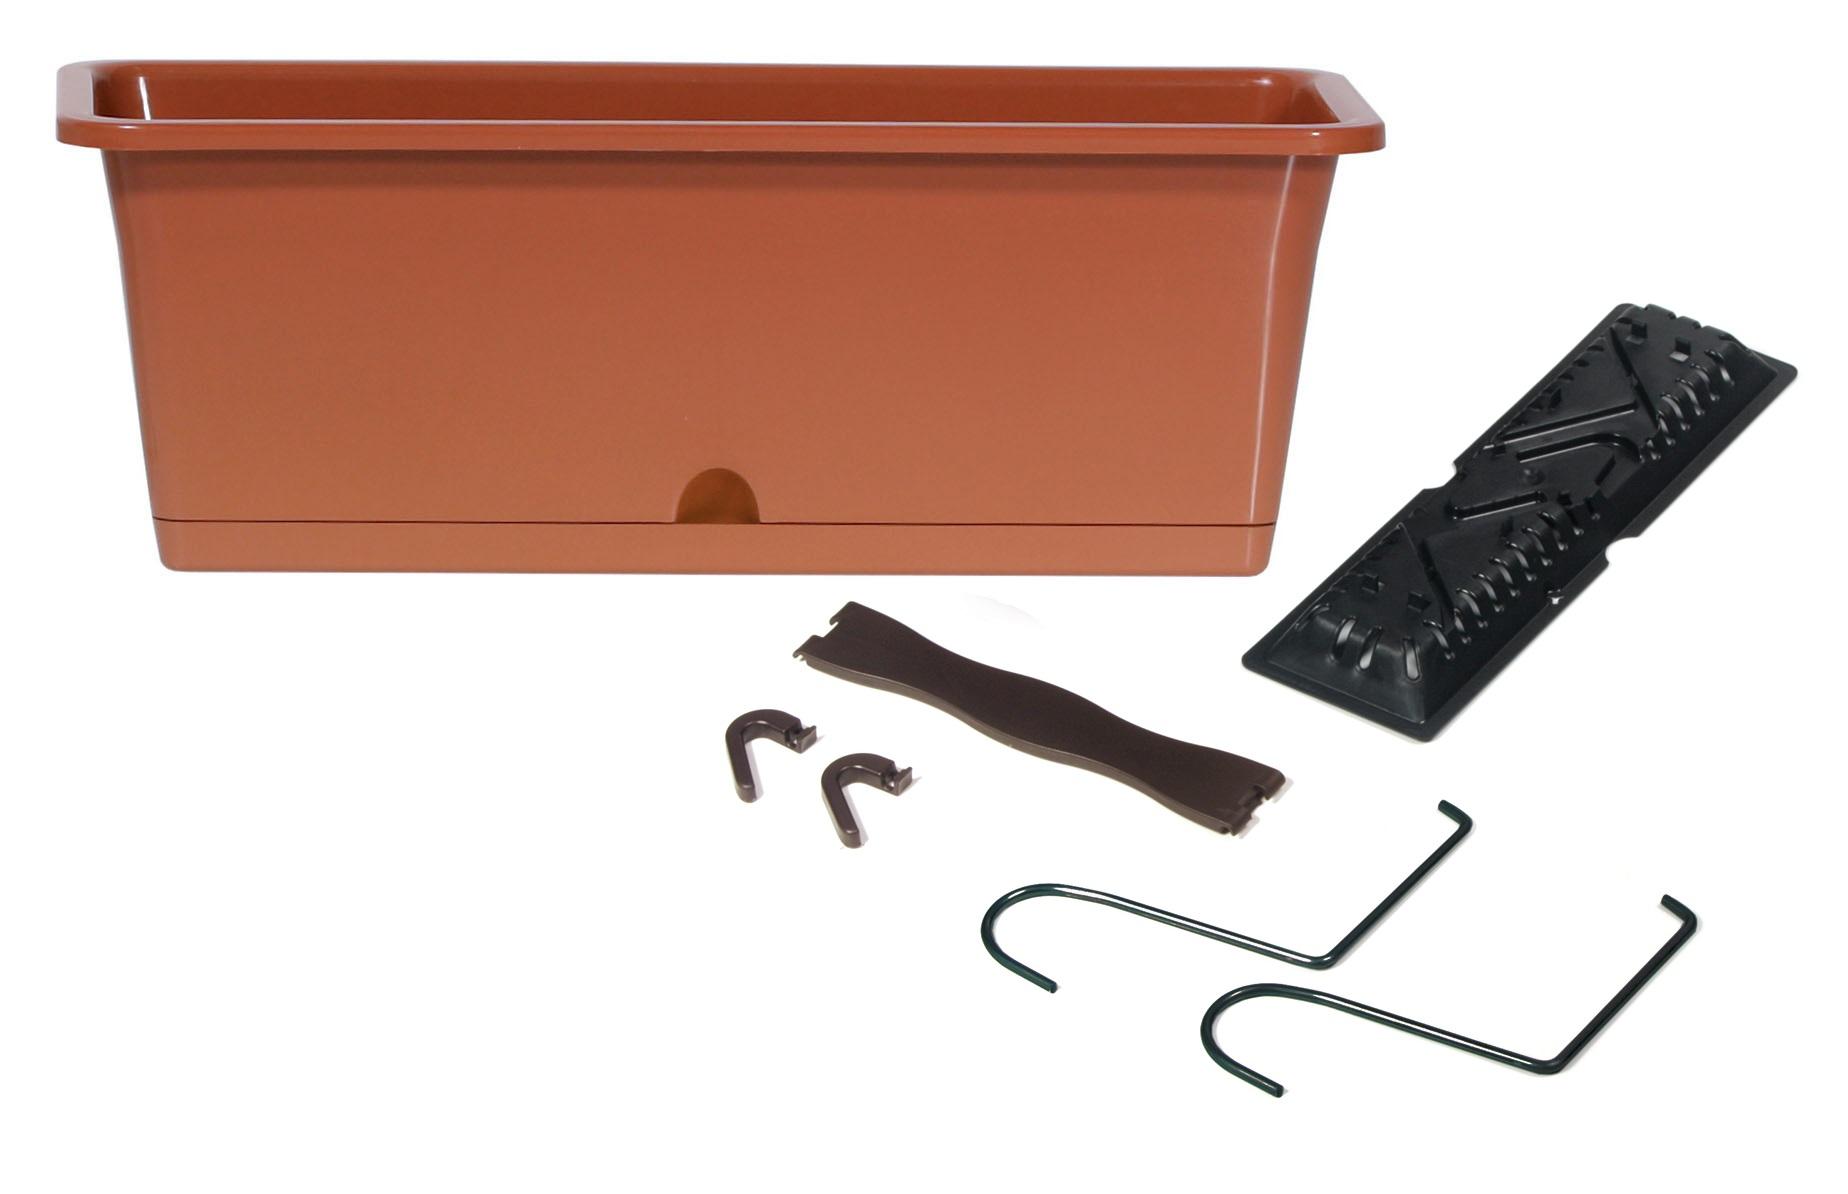 PROSPERPLAST Truhlík CAMELIA W s háky terakota 59,5cm